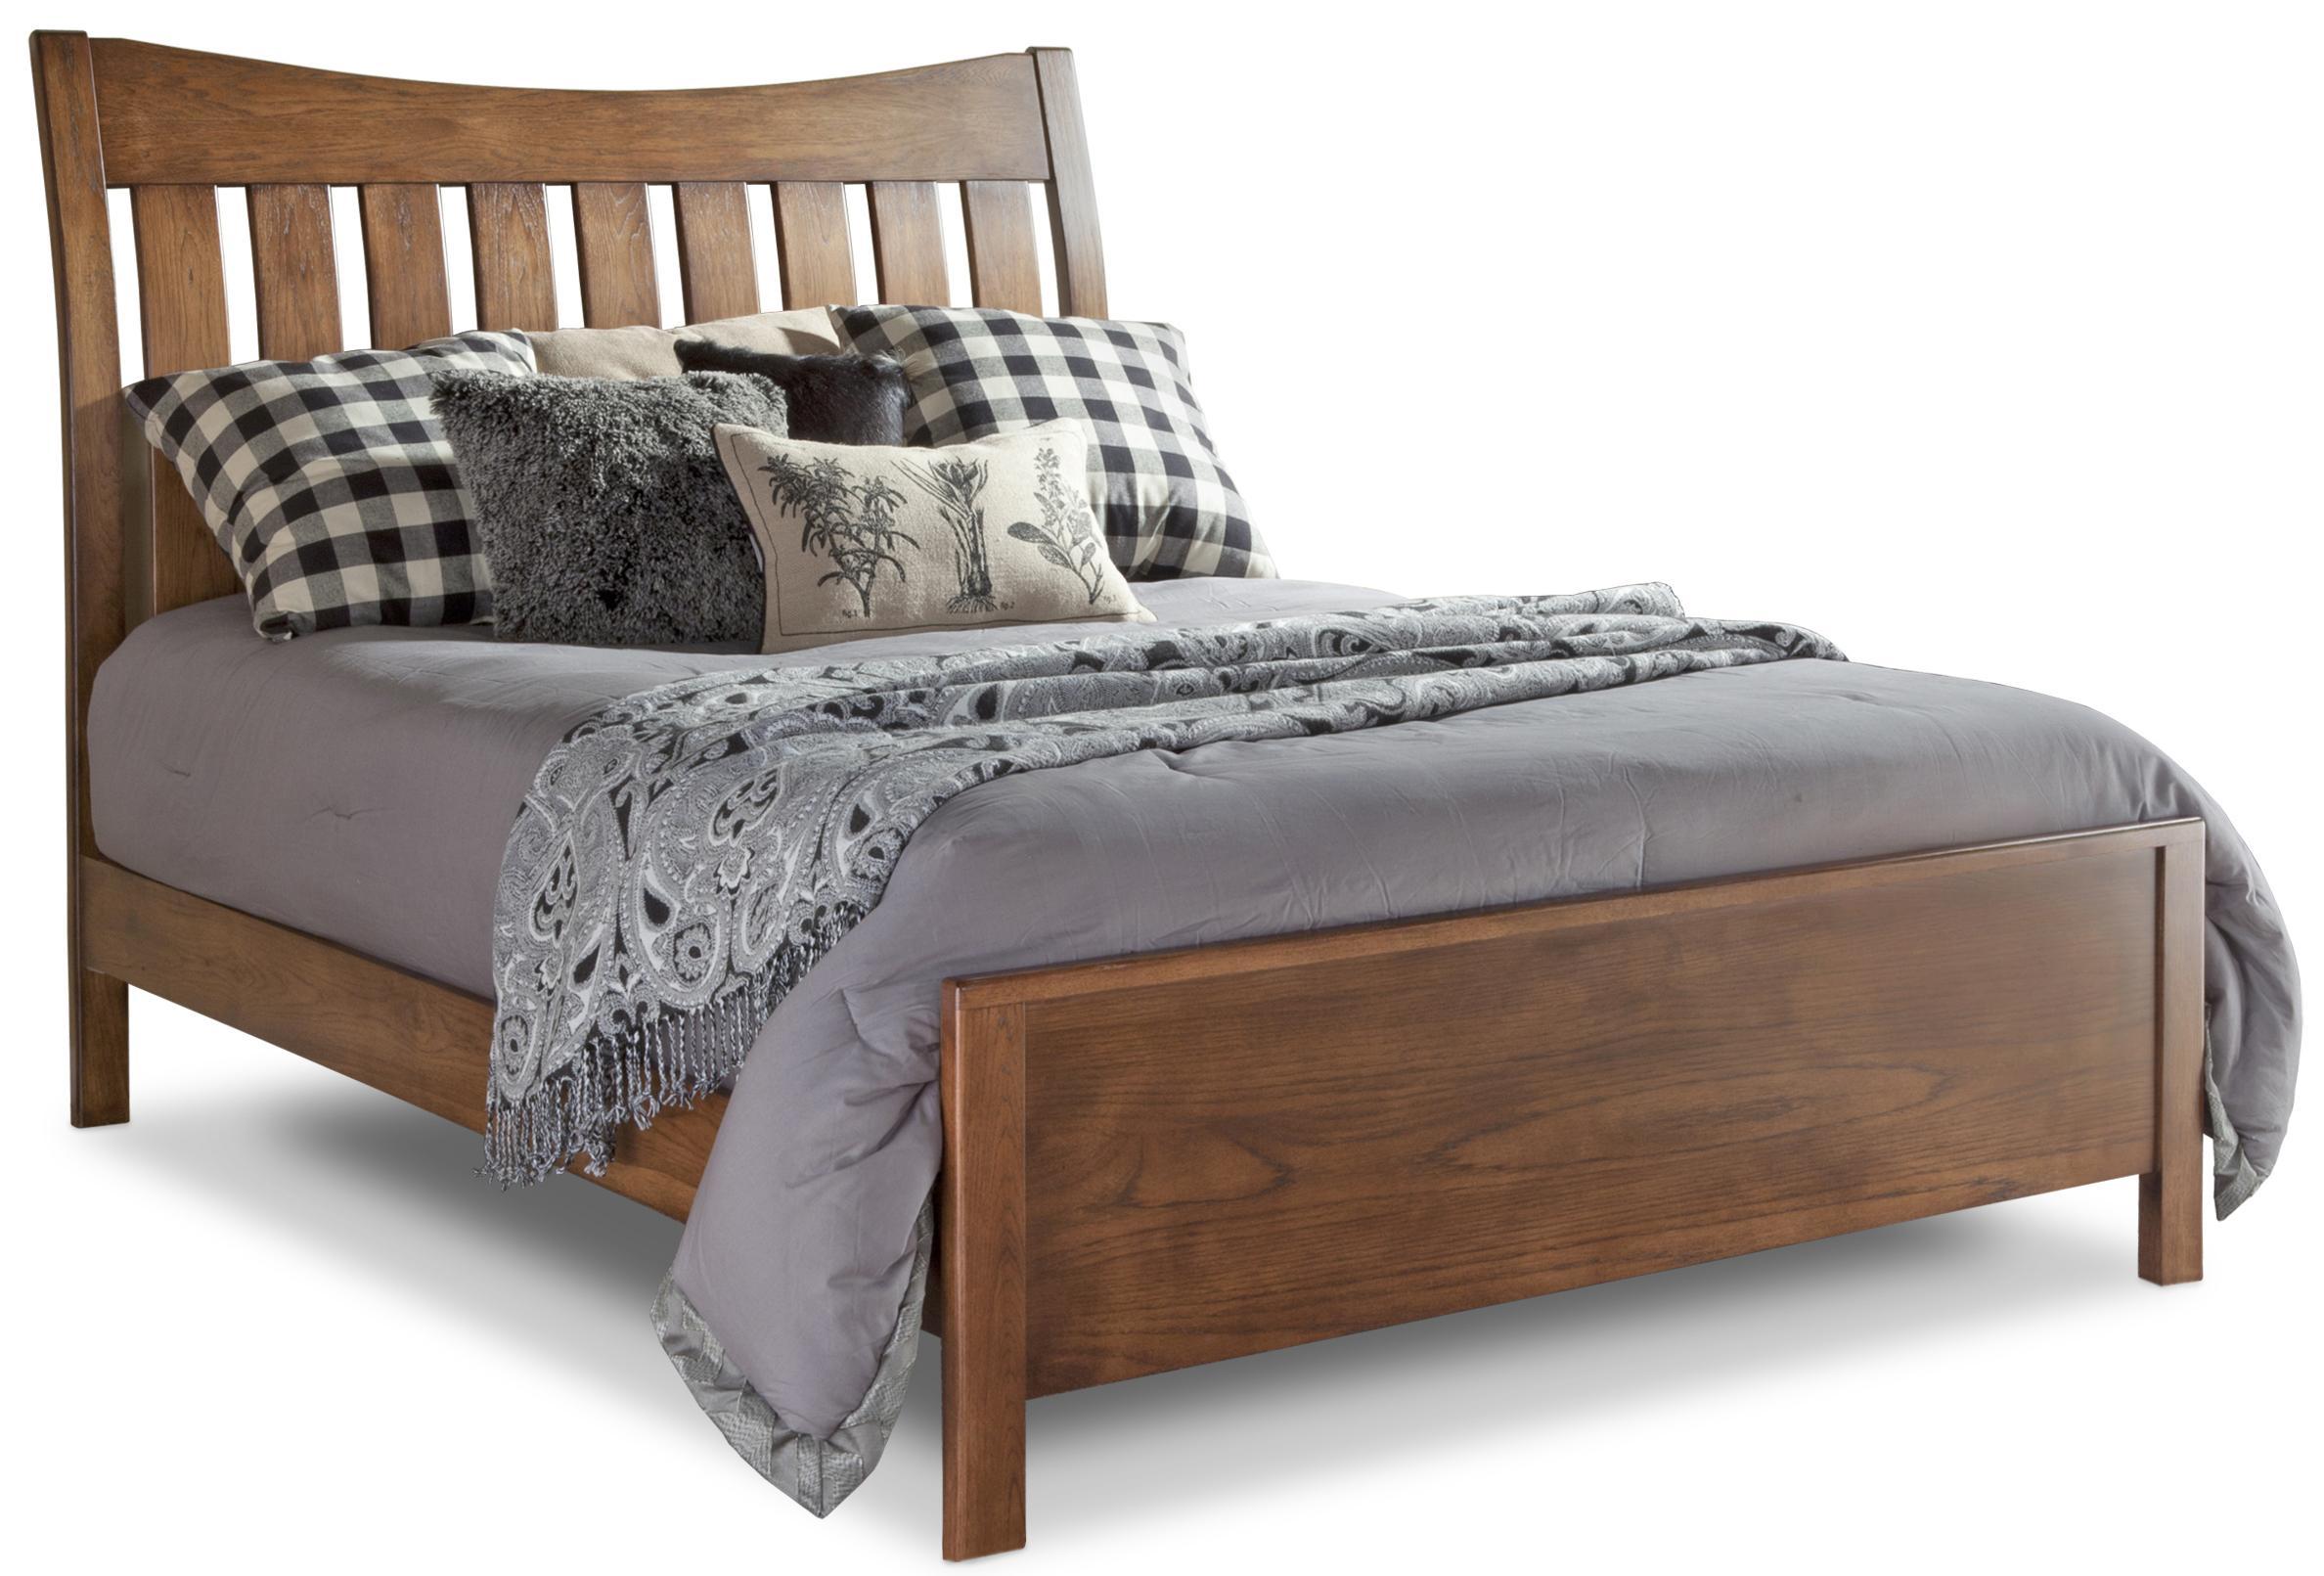 Bedfort DA Full Bed by Daniel's Amish at Saugerties Furniture Mart